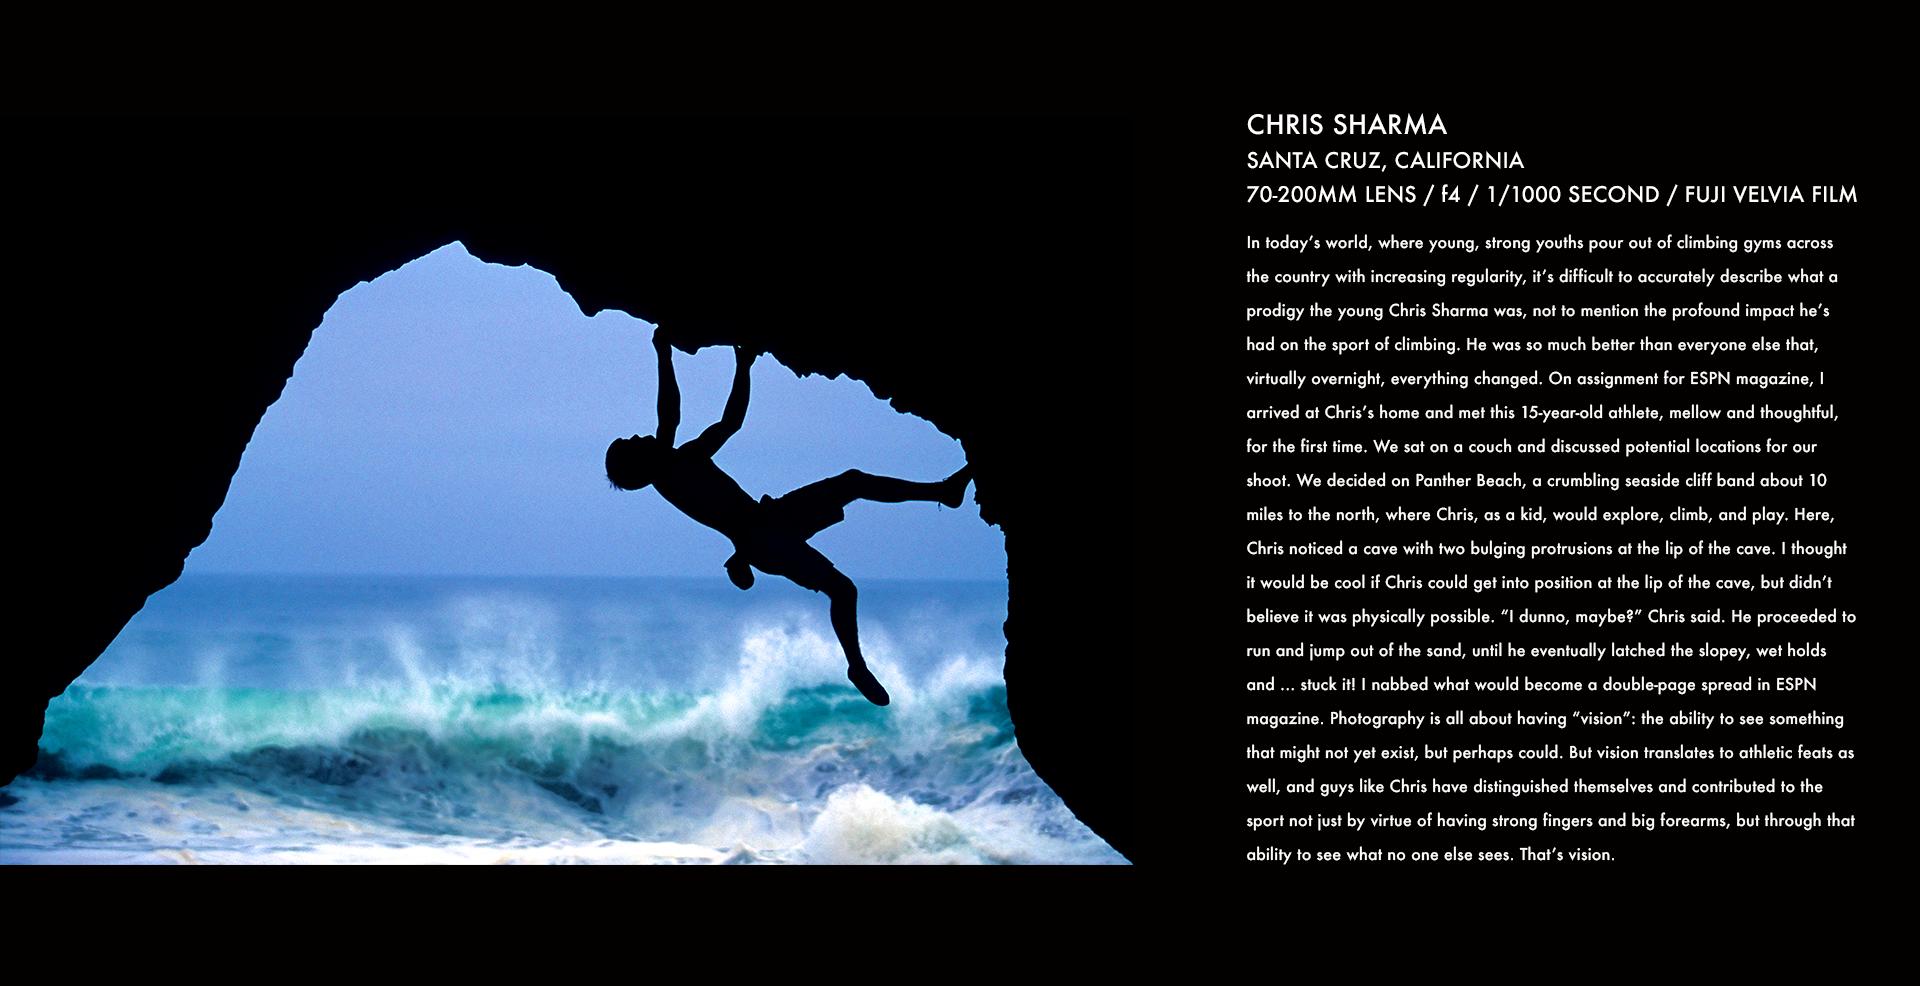 chris sharma, climbing, santa cruz, corey rich, stories behind the images